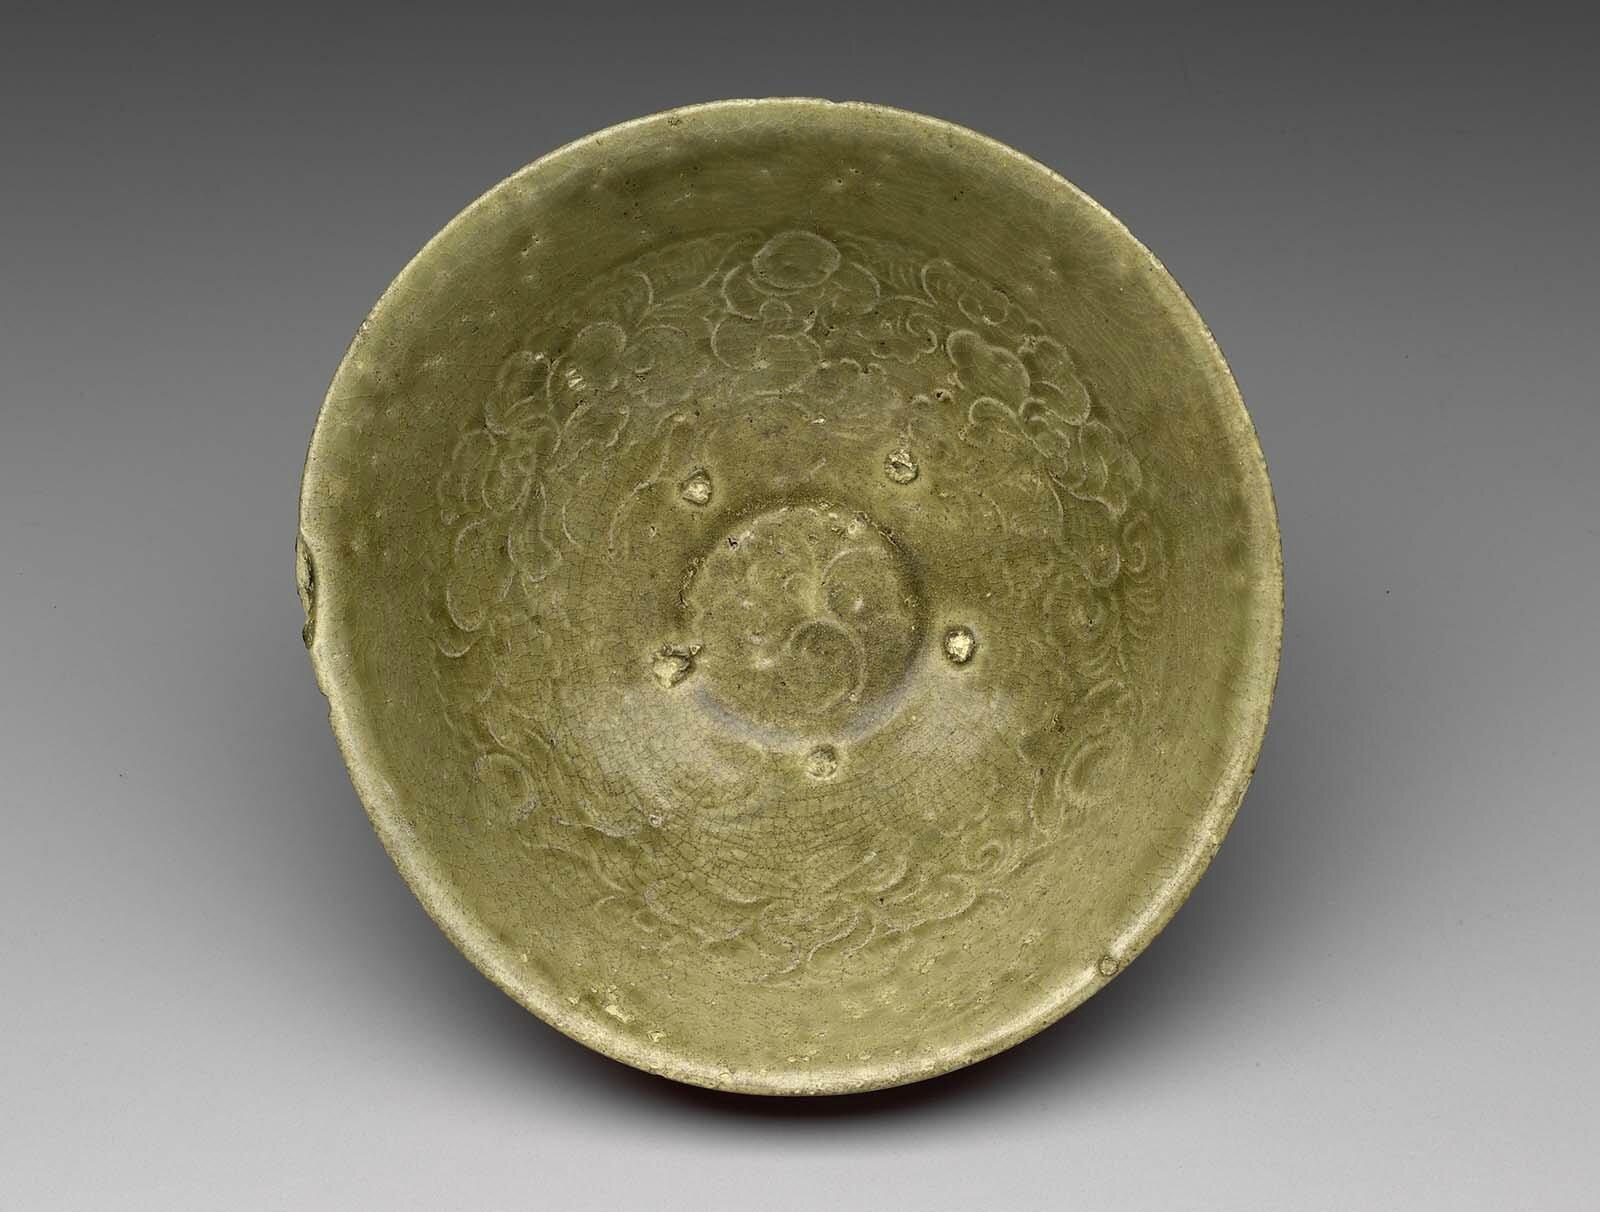 Bowl, Vietnam, Ly-Tran Dynasty, 12th–13th century